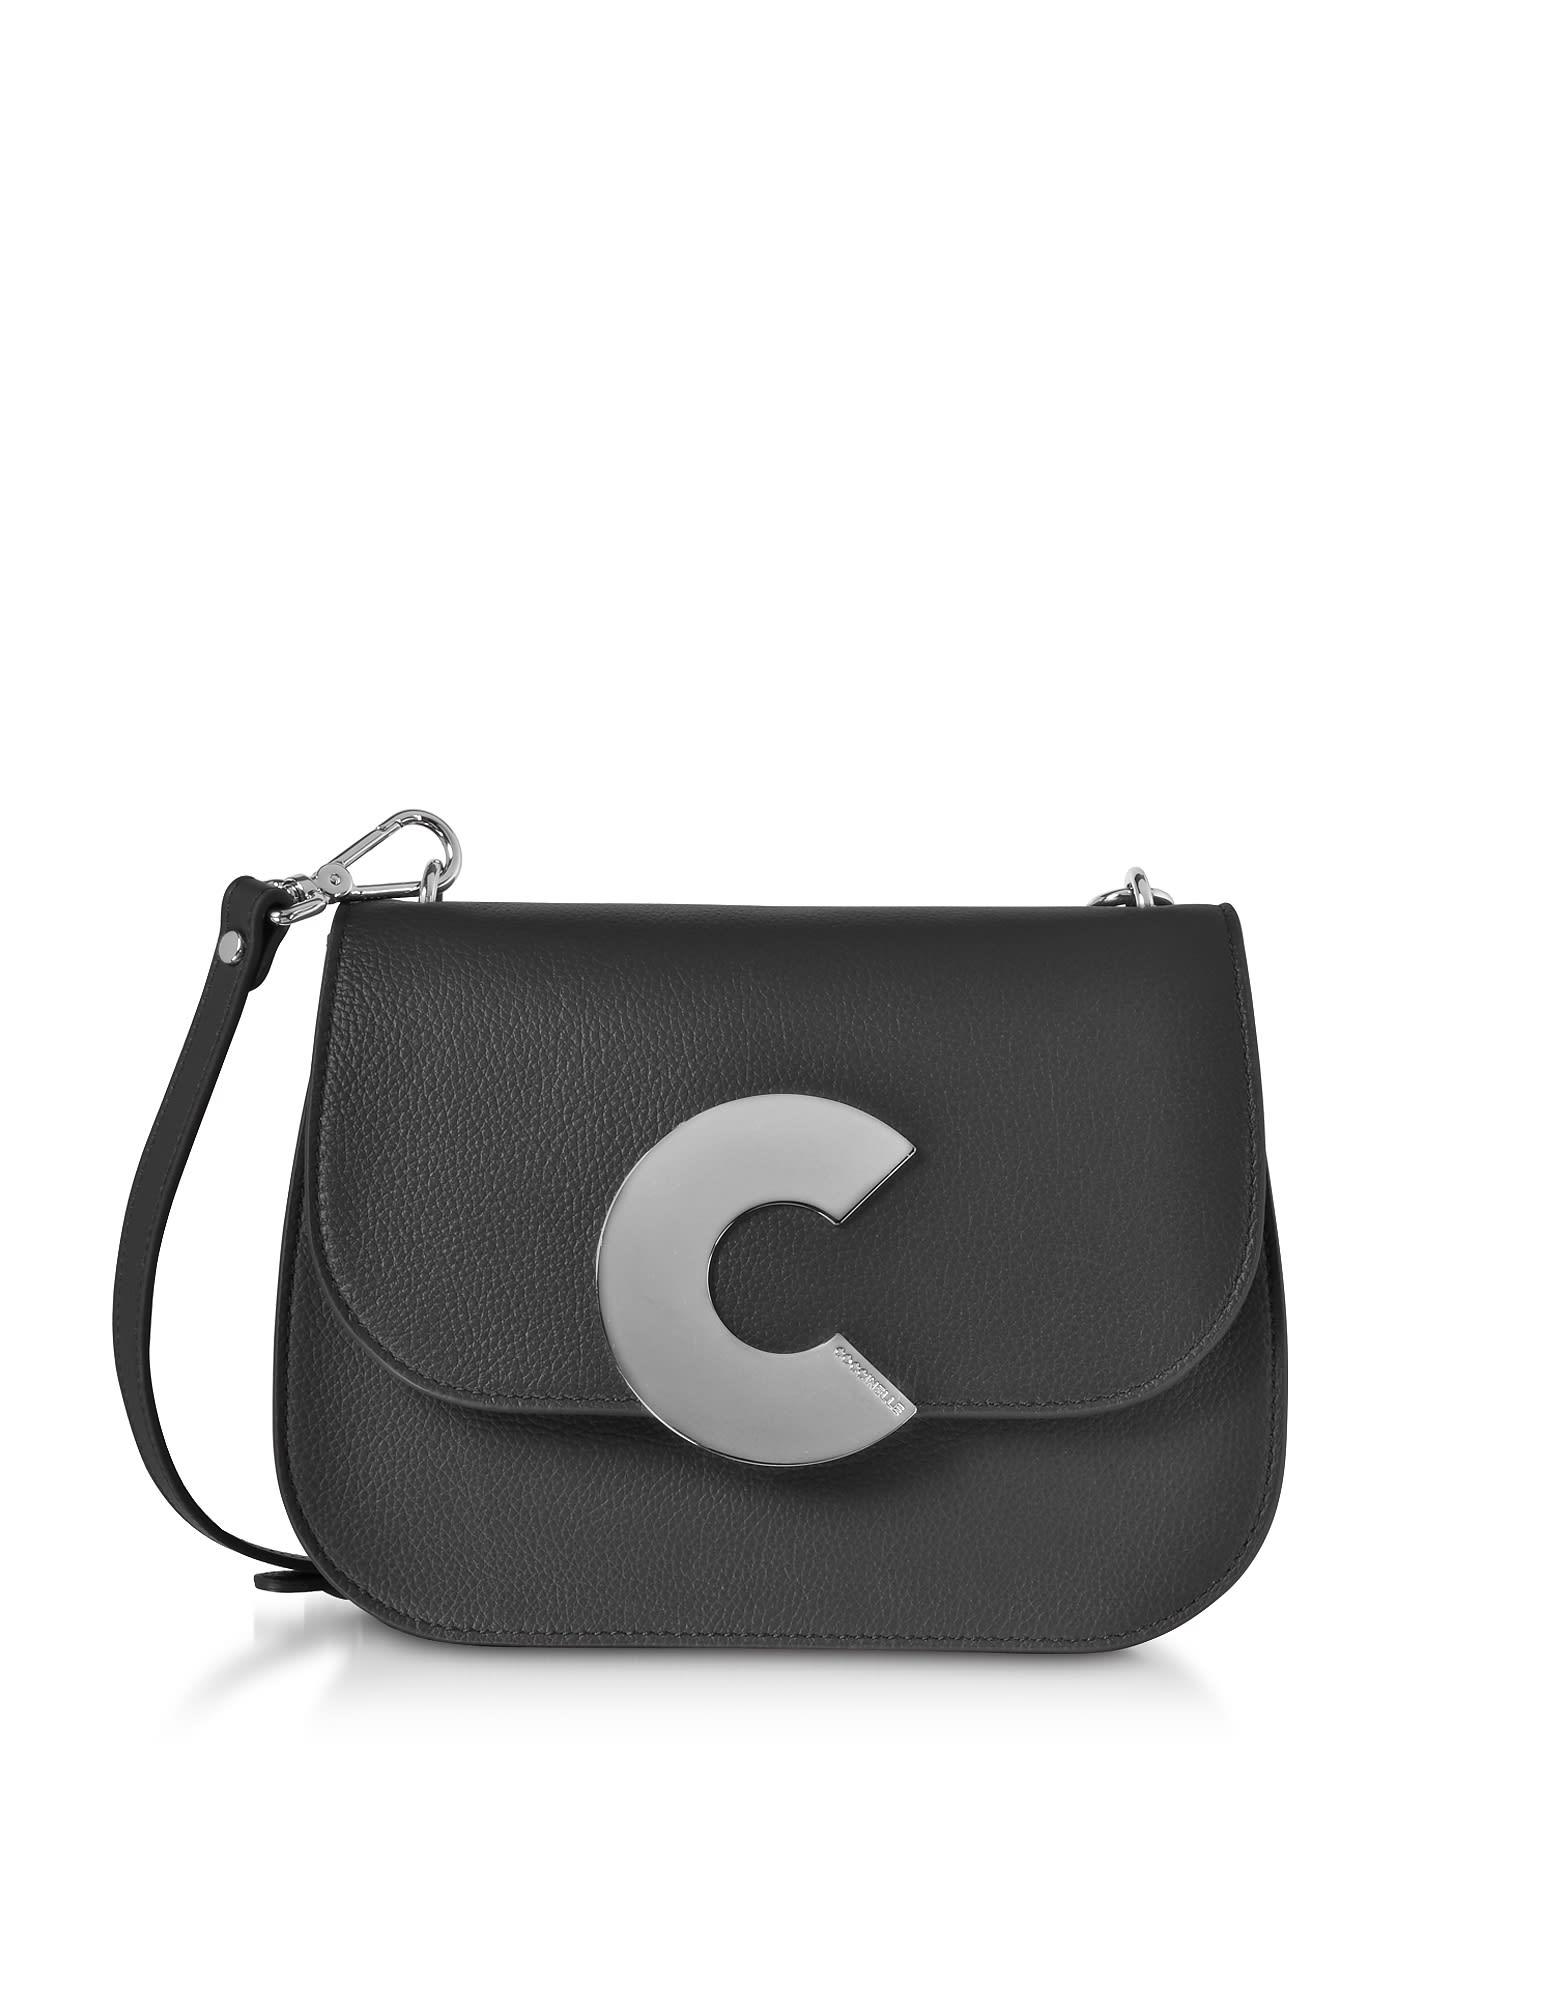 50986167743 Coccinelle Craquante Grained Leather Medium Crossbody Bag